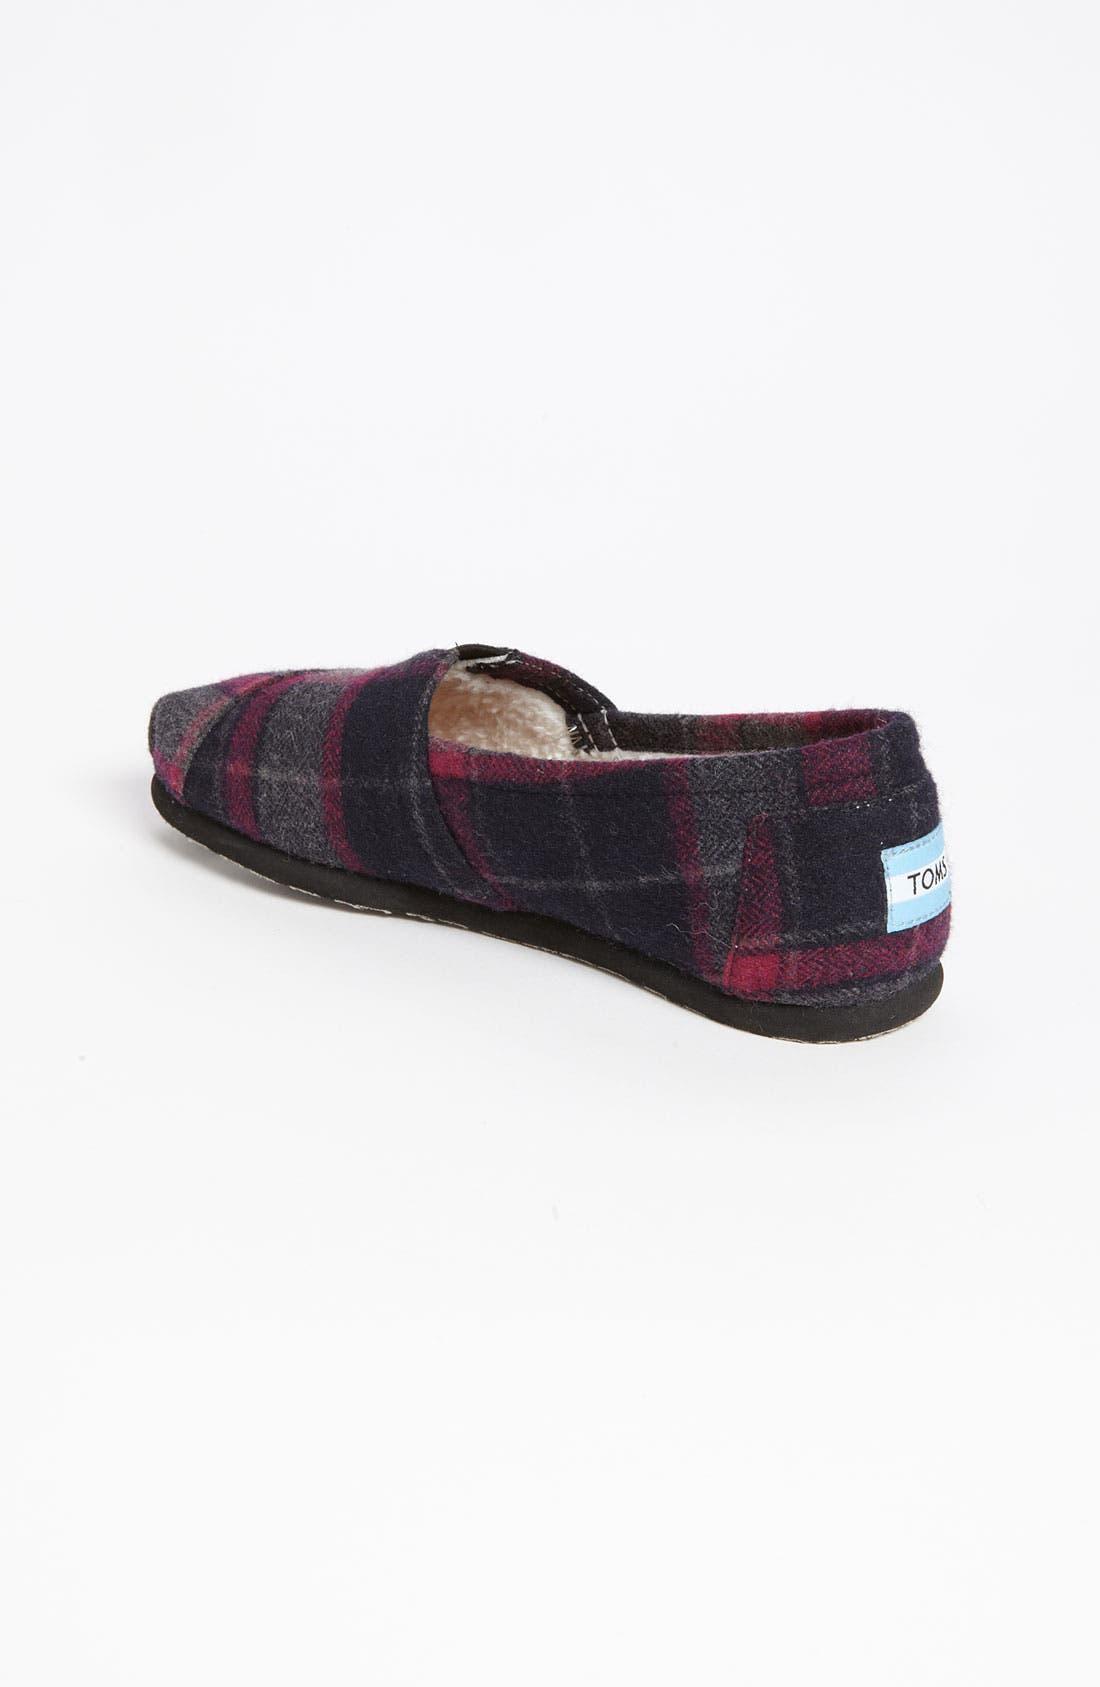 Alternate Image 2  - TOMS 'Classic - Plaid' Wool Slip-On